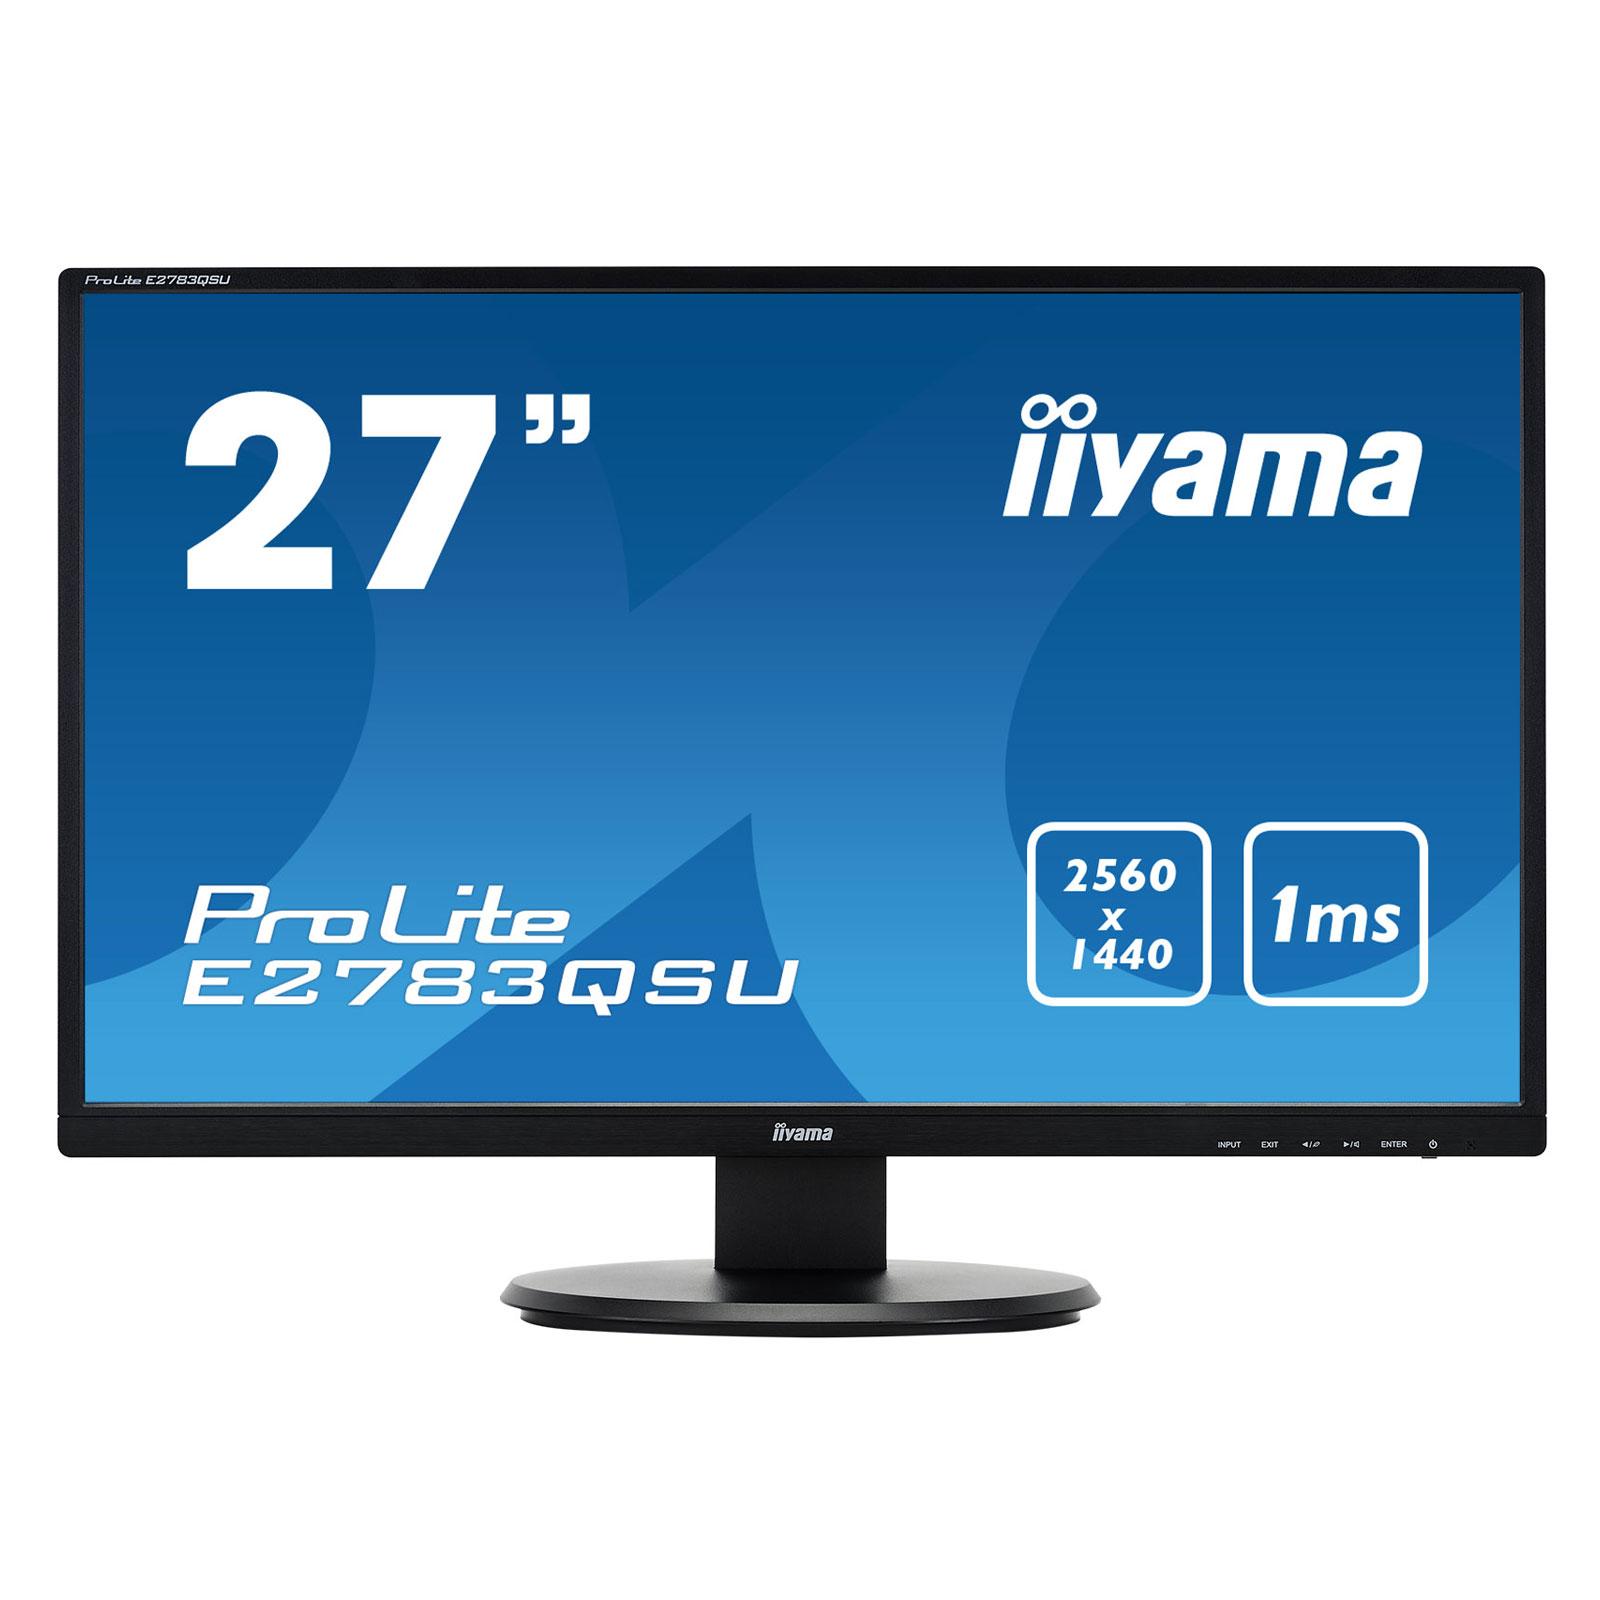 Iiyama 27 led e2783qsu b1 ecran pc iiyama sur for Eclairage ecran pc